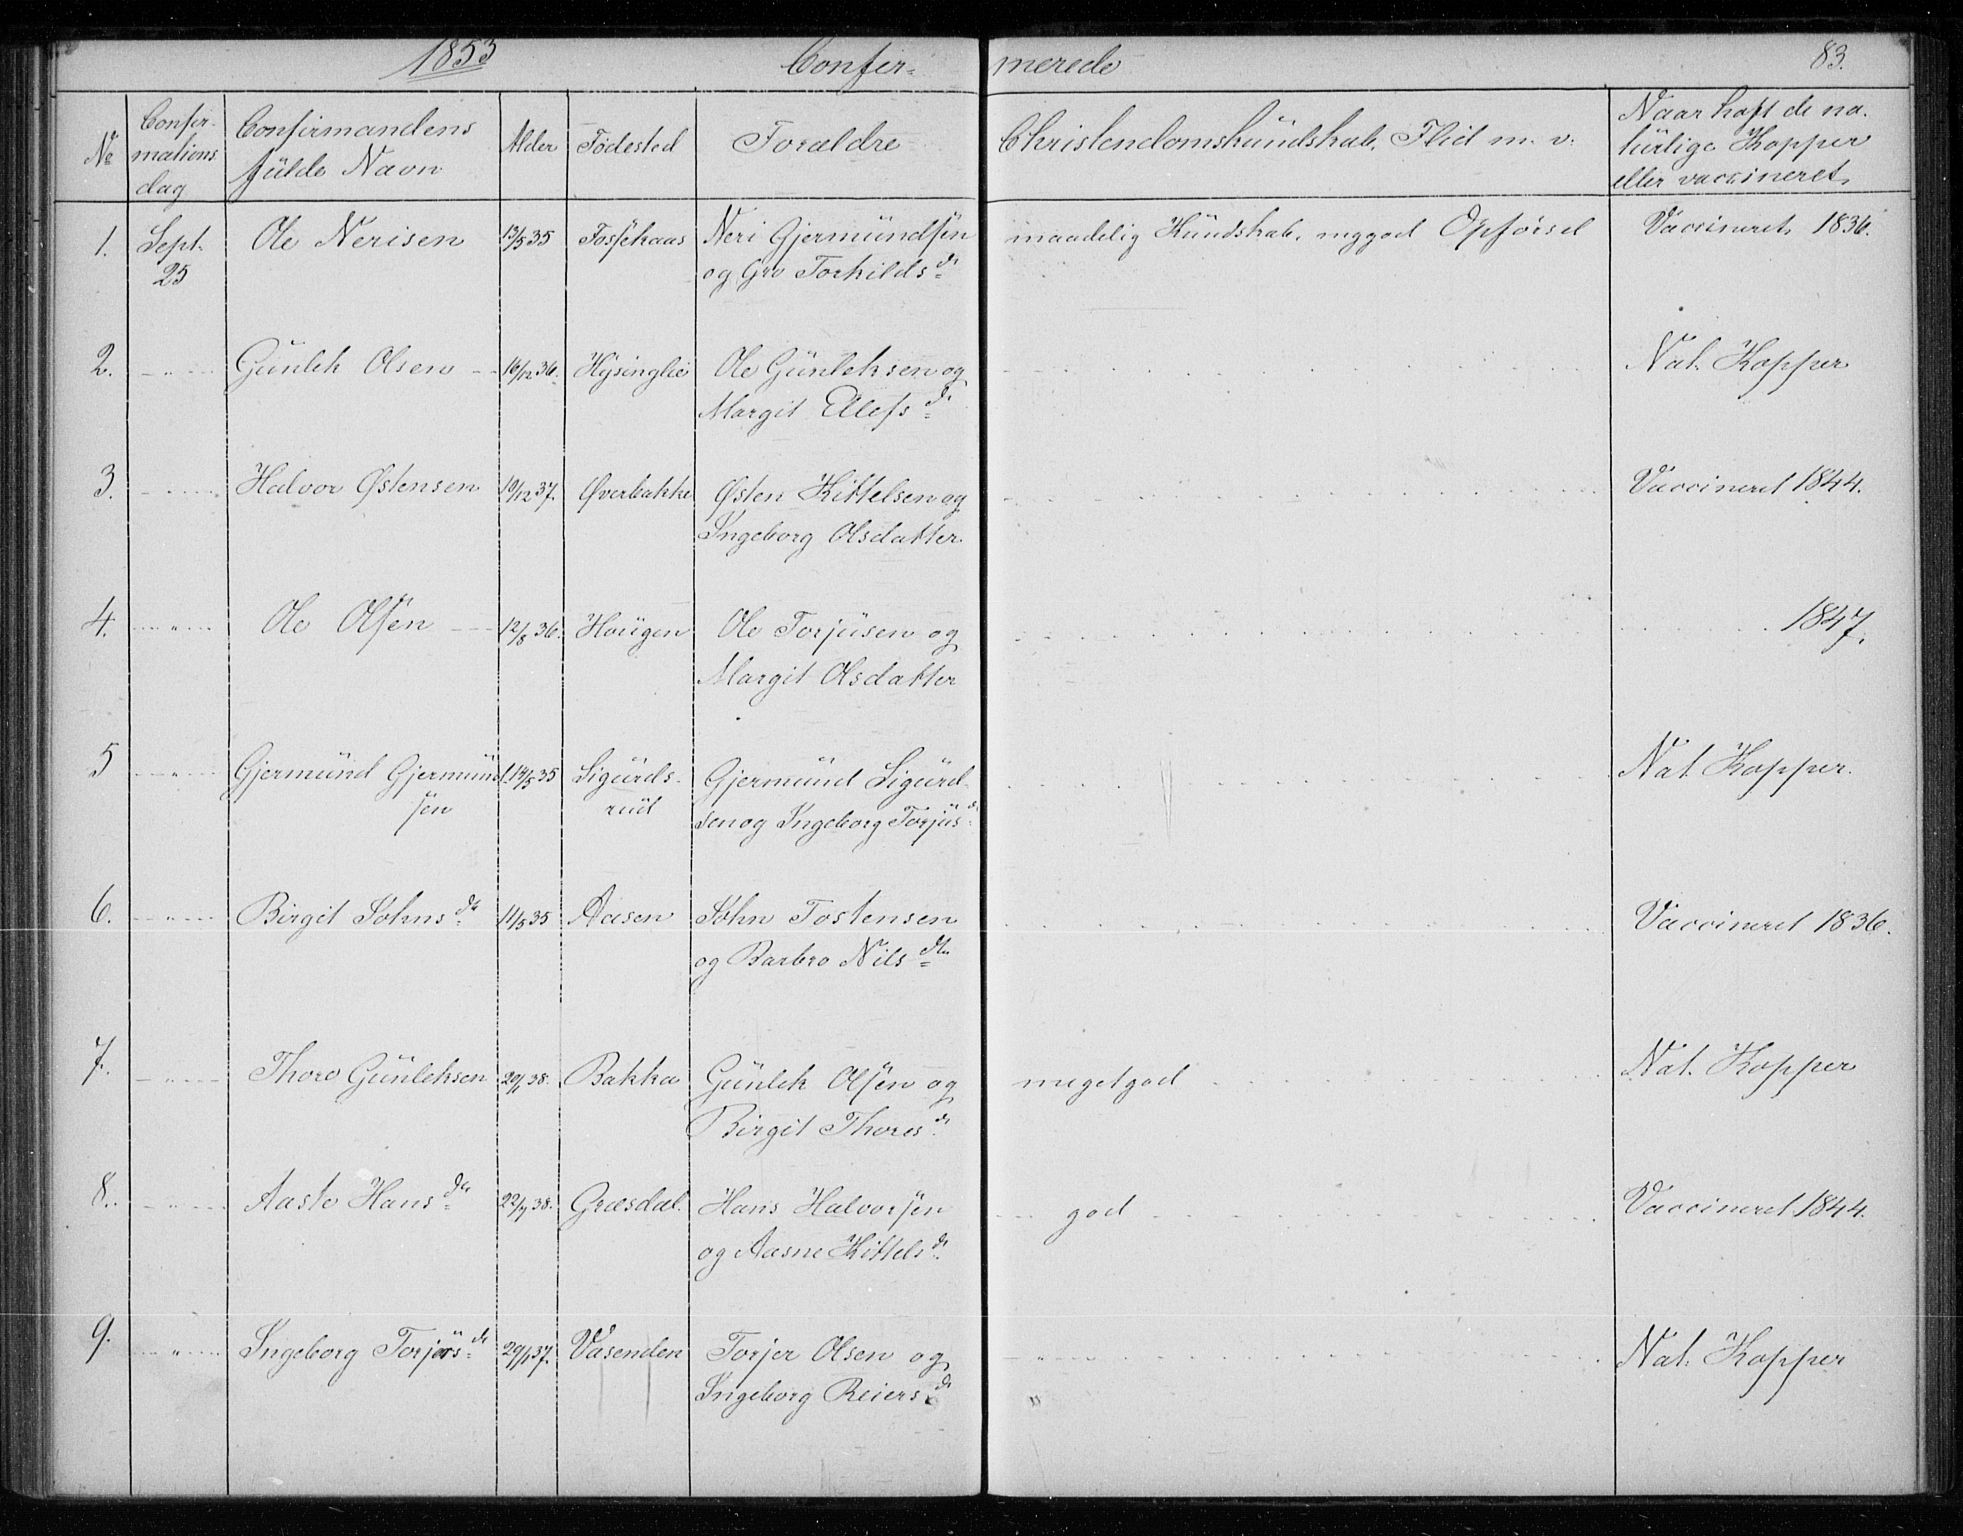 SAKO, Gransherad kirkebøker, F/Fb/L0003: Ministerialbok nr. II 3, 1844-1859, s. 83